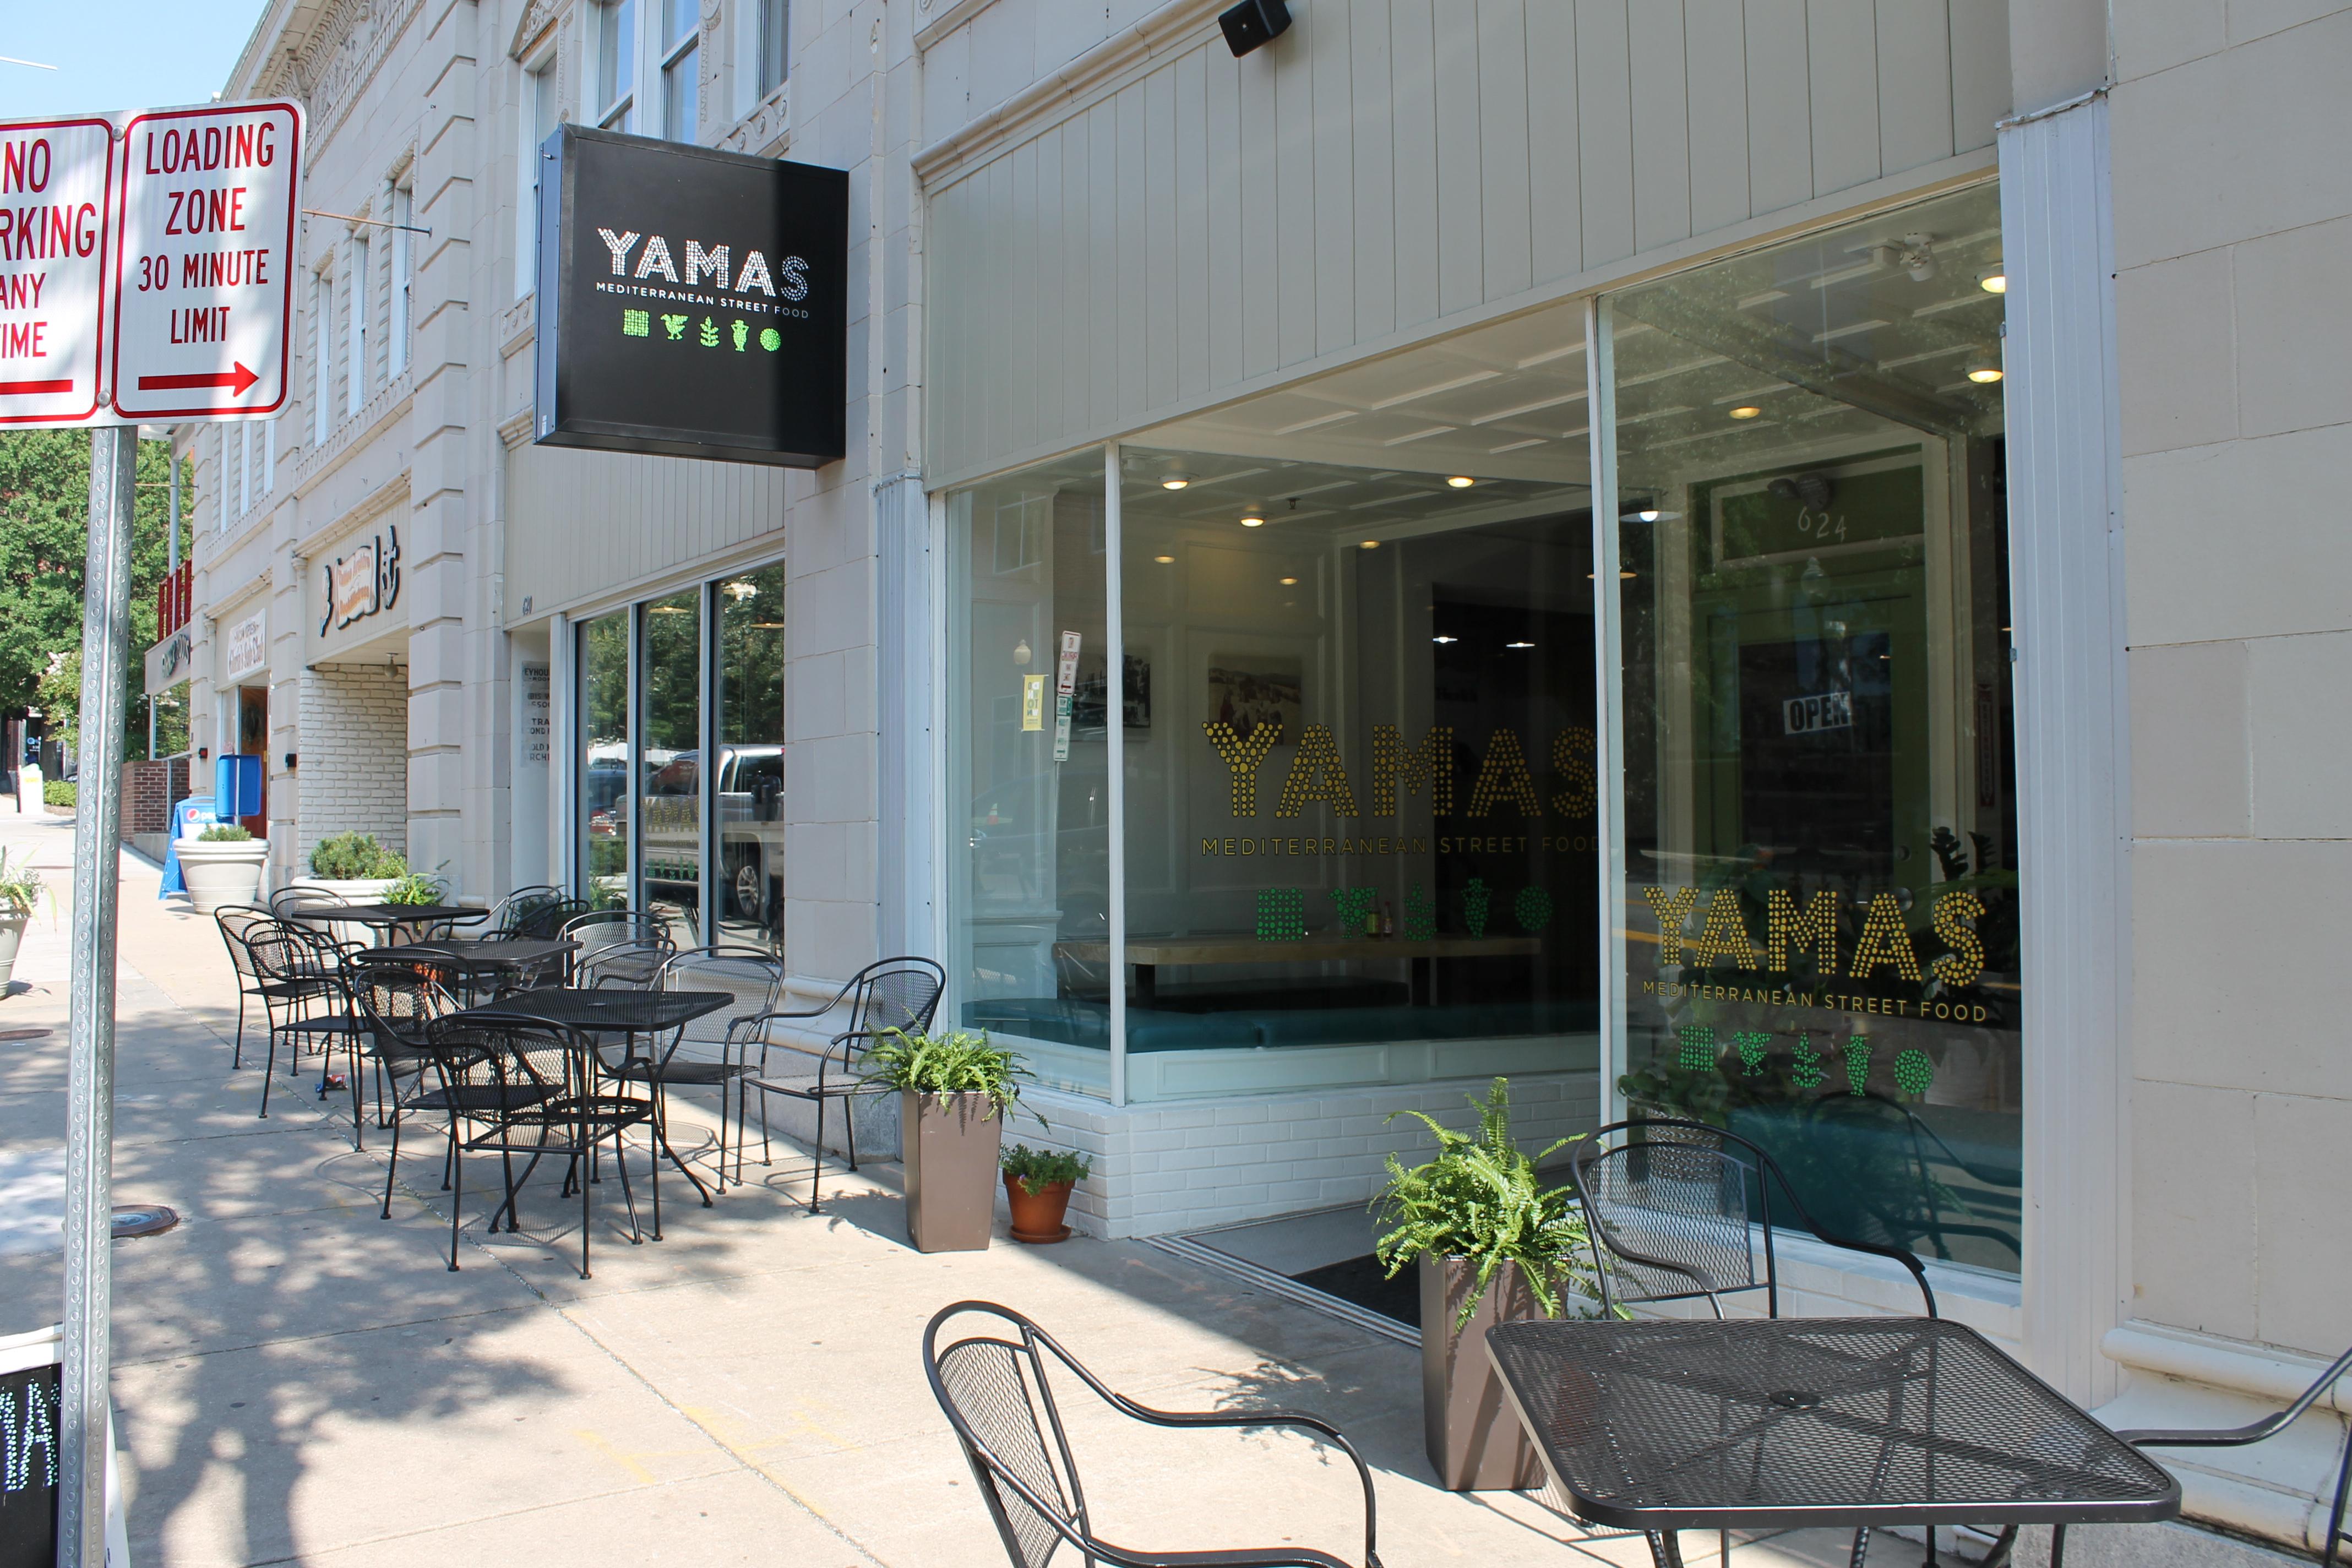 Street View of Yamas